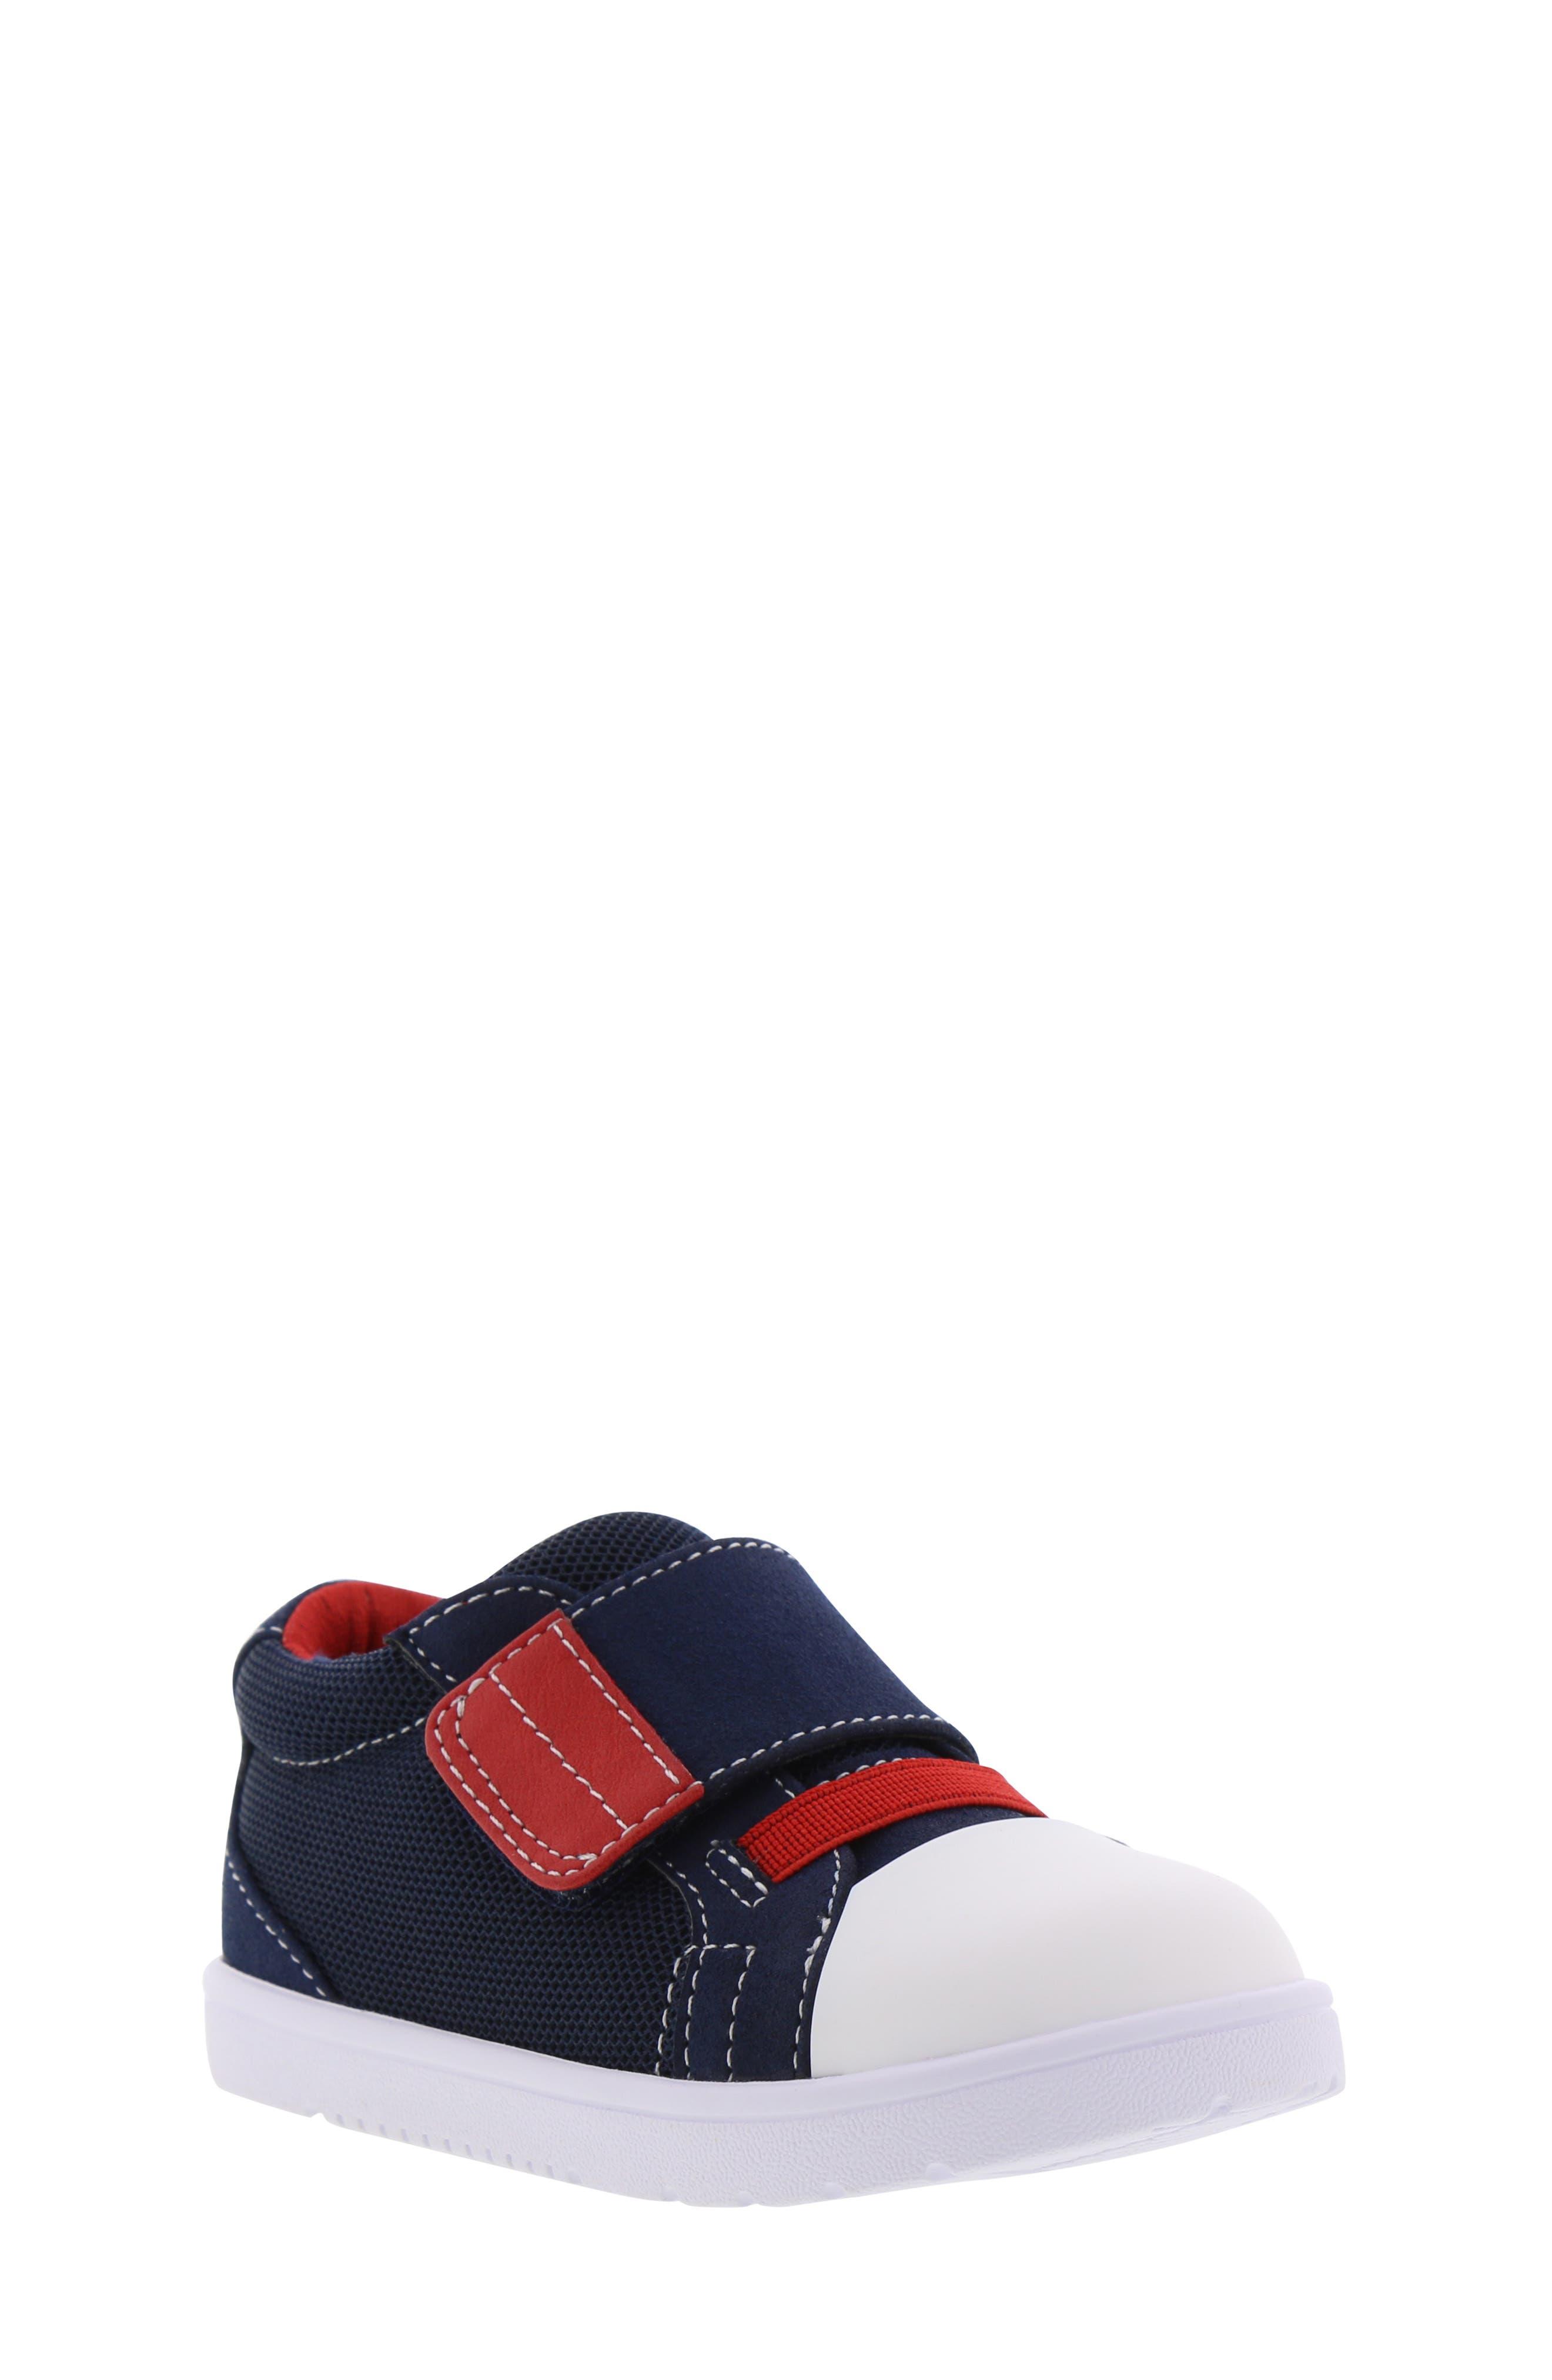 BØRN,                             Bailey Clark Sneaker,                             Main thumbnail 1, color,                             NAVY